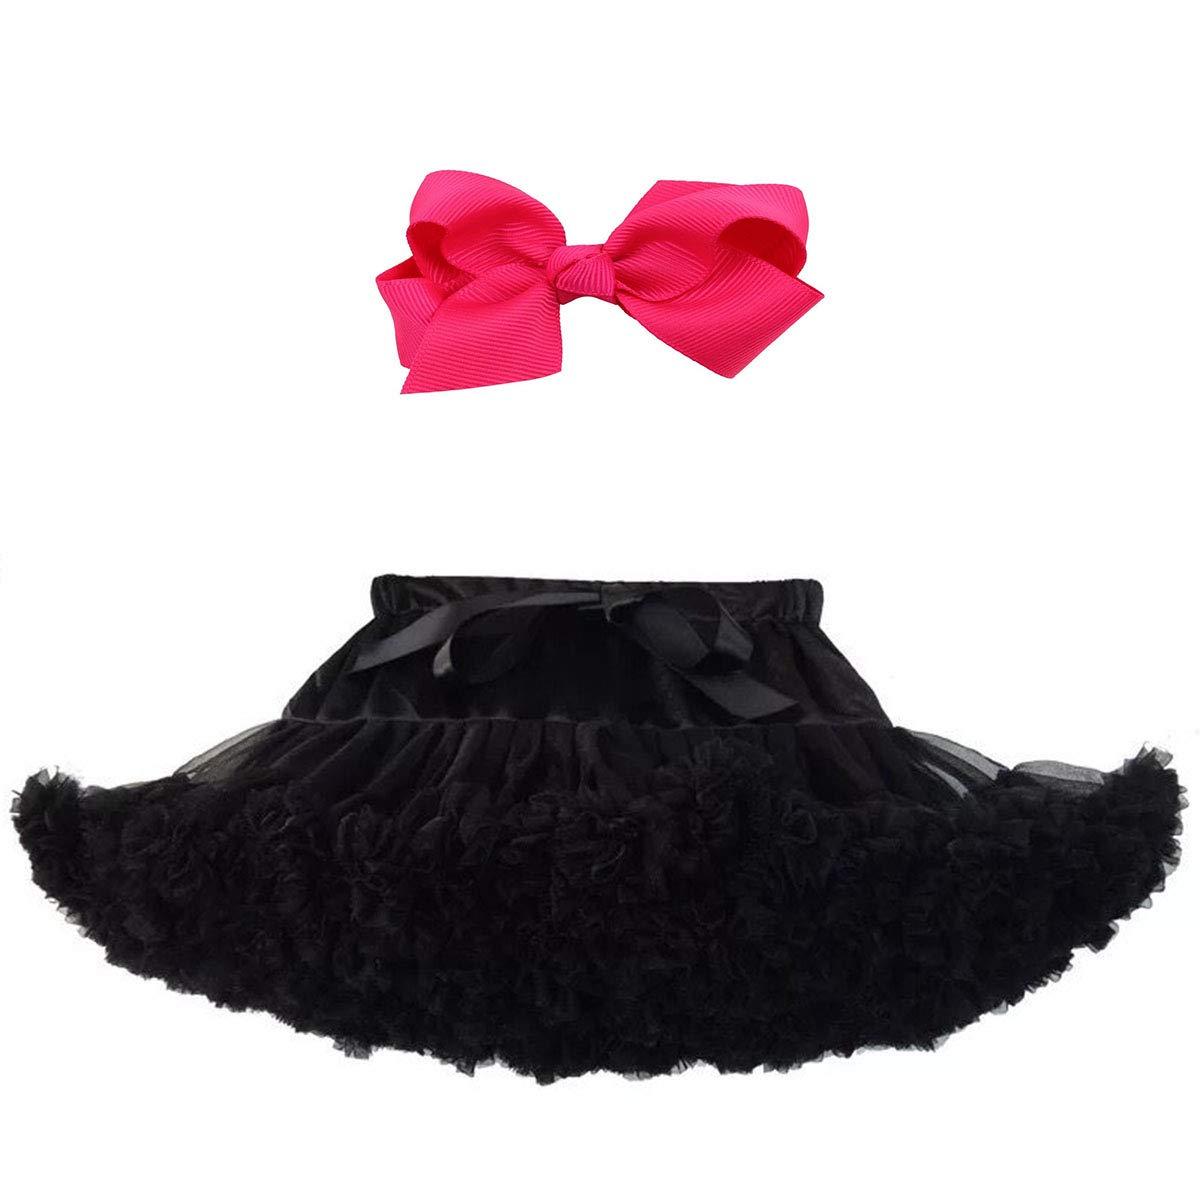 Z-YQL Baby Girls Dance Tutu Pettiskirt Multi-Layer Princess Ballet Tutu Dance Skirt with Hair Clip